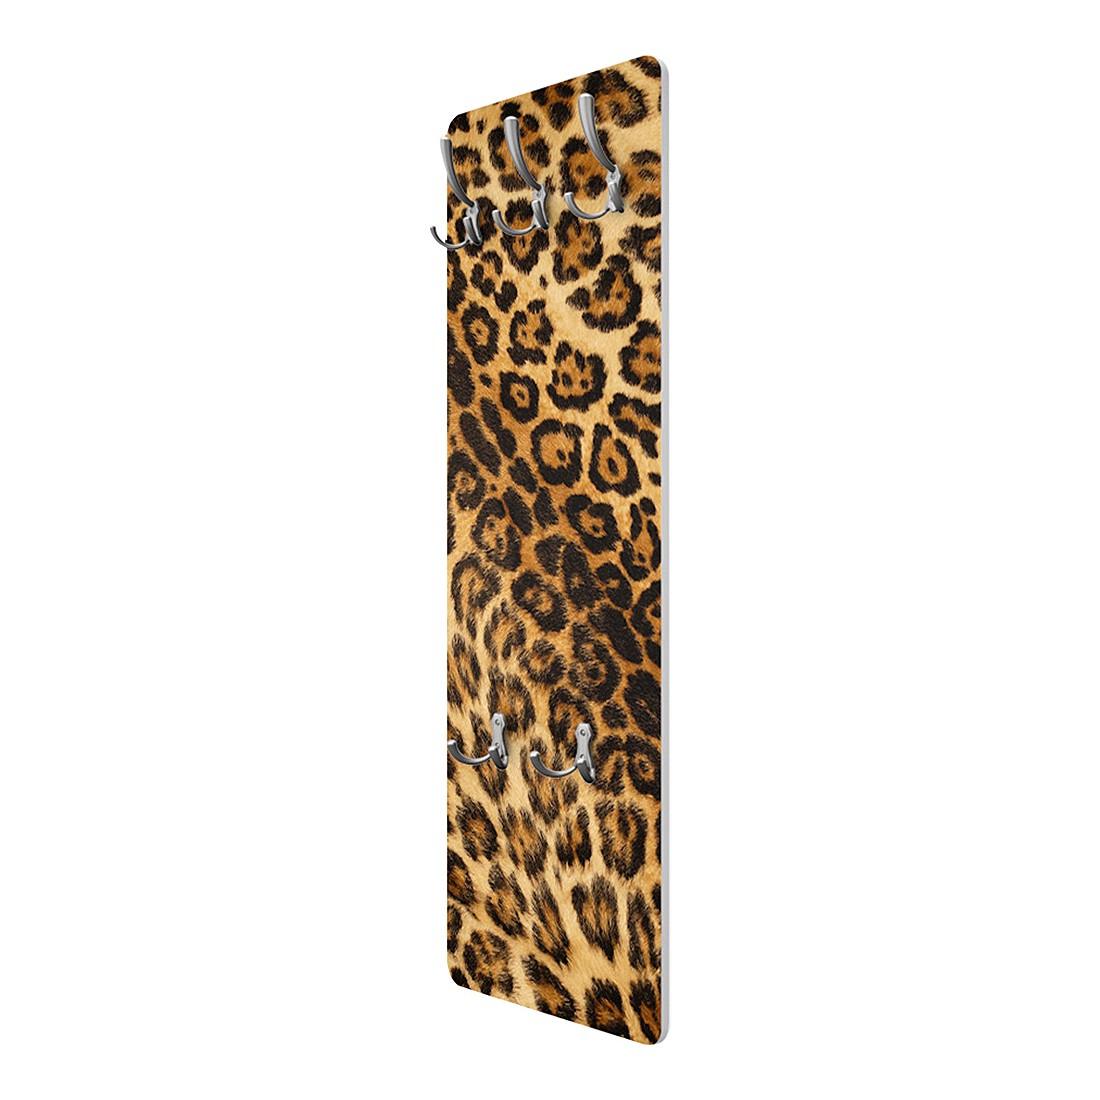 Wandgarderobe Jaguar Skin, Mantiburi günstig online kaufen